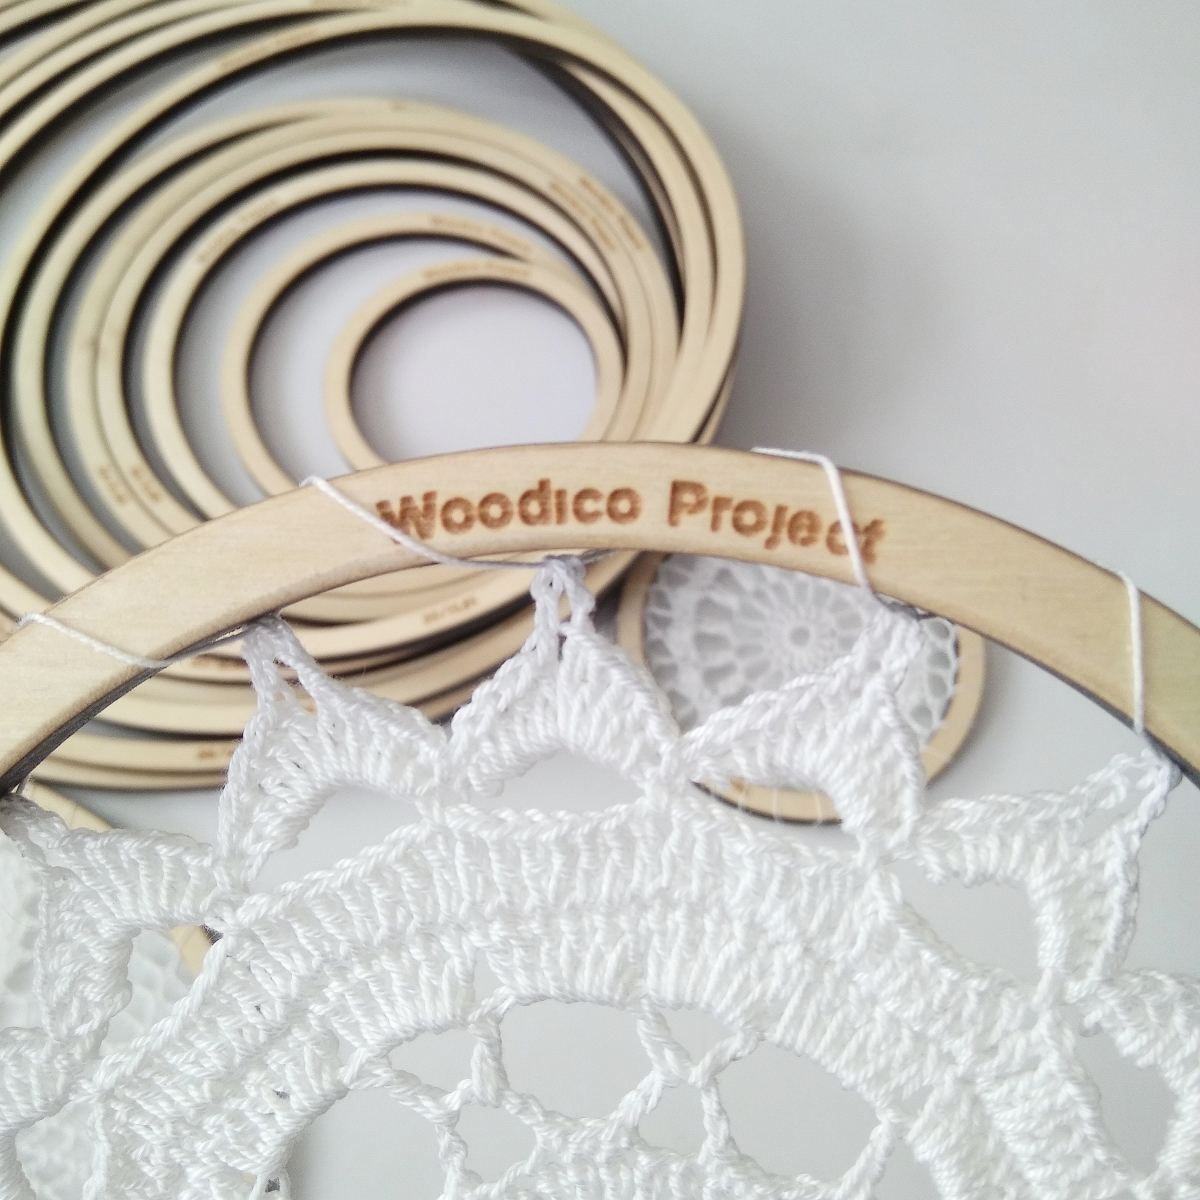 woodico.pro dream catcher base set of 15 rings 12 40 cm 7 1200x1200 - Dream catcher base / Set of 15 rings 12-40 cm